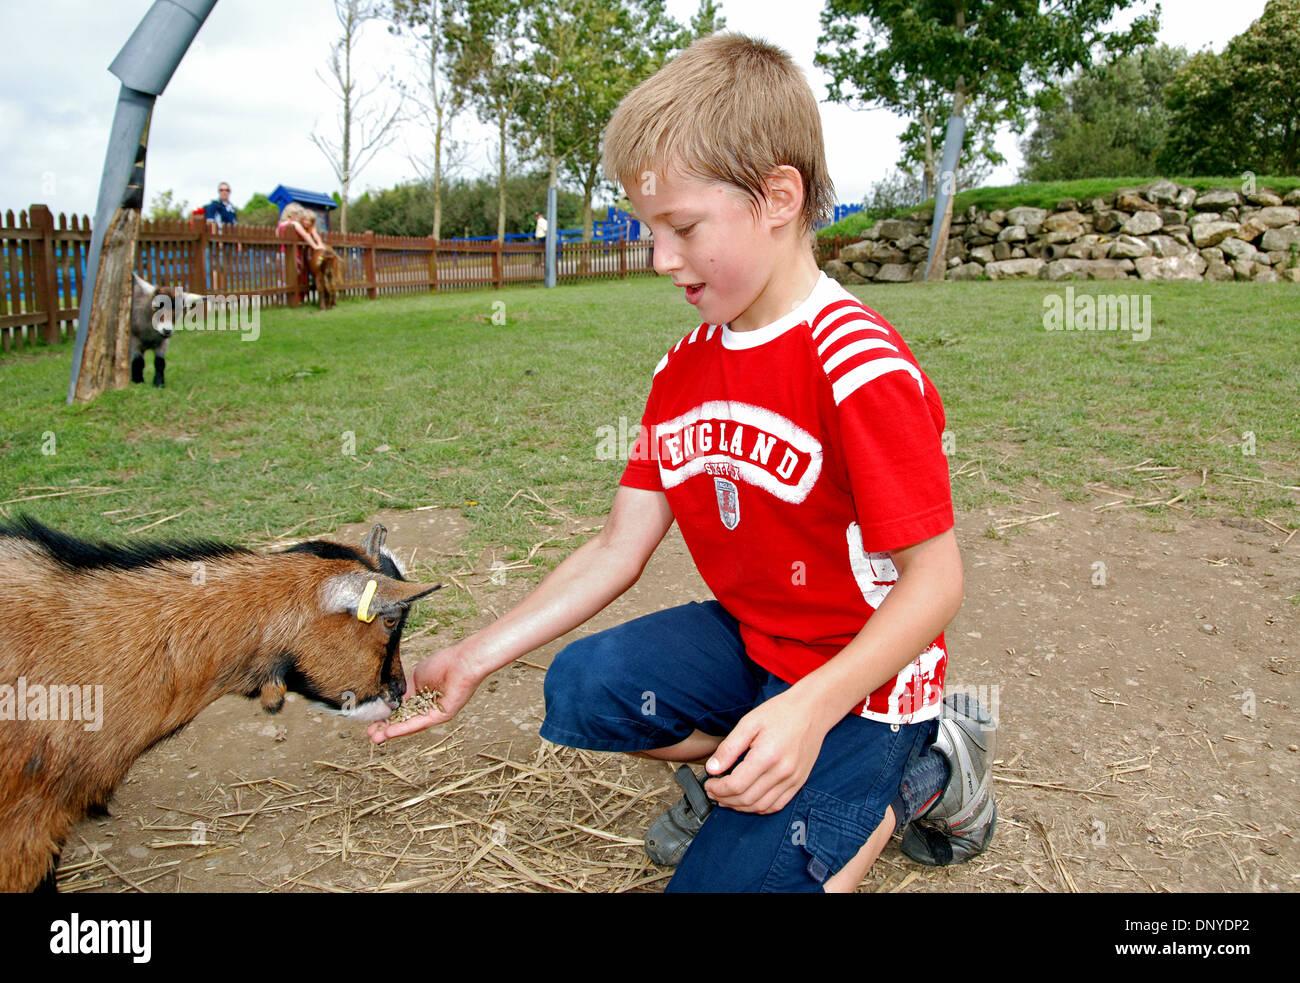 a small boy feeding a pygmy goat - Stock Image